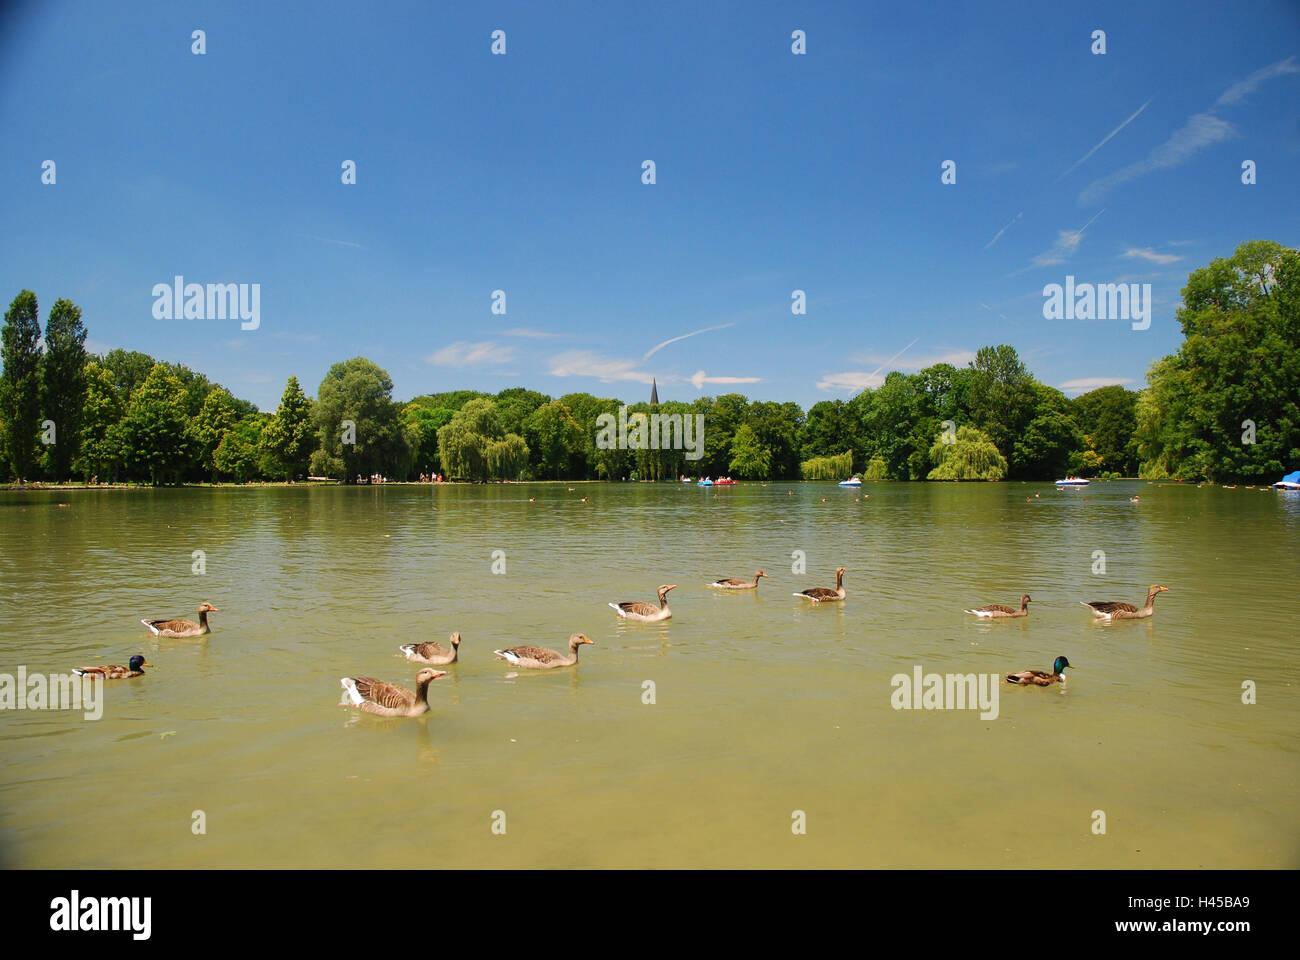 Germany, Bavaria, Munich, English garden, Kleinhesseloher lake, - Stock Image